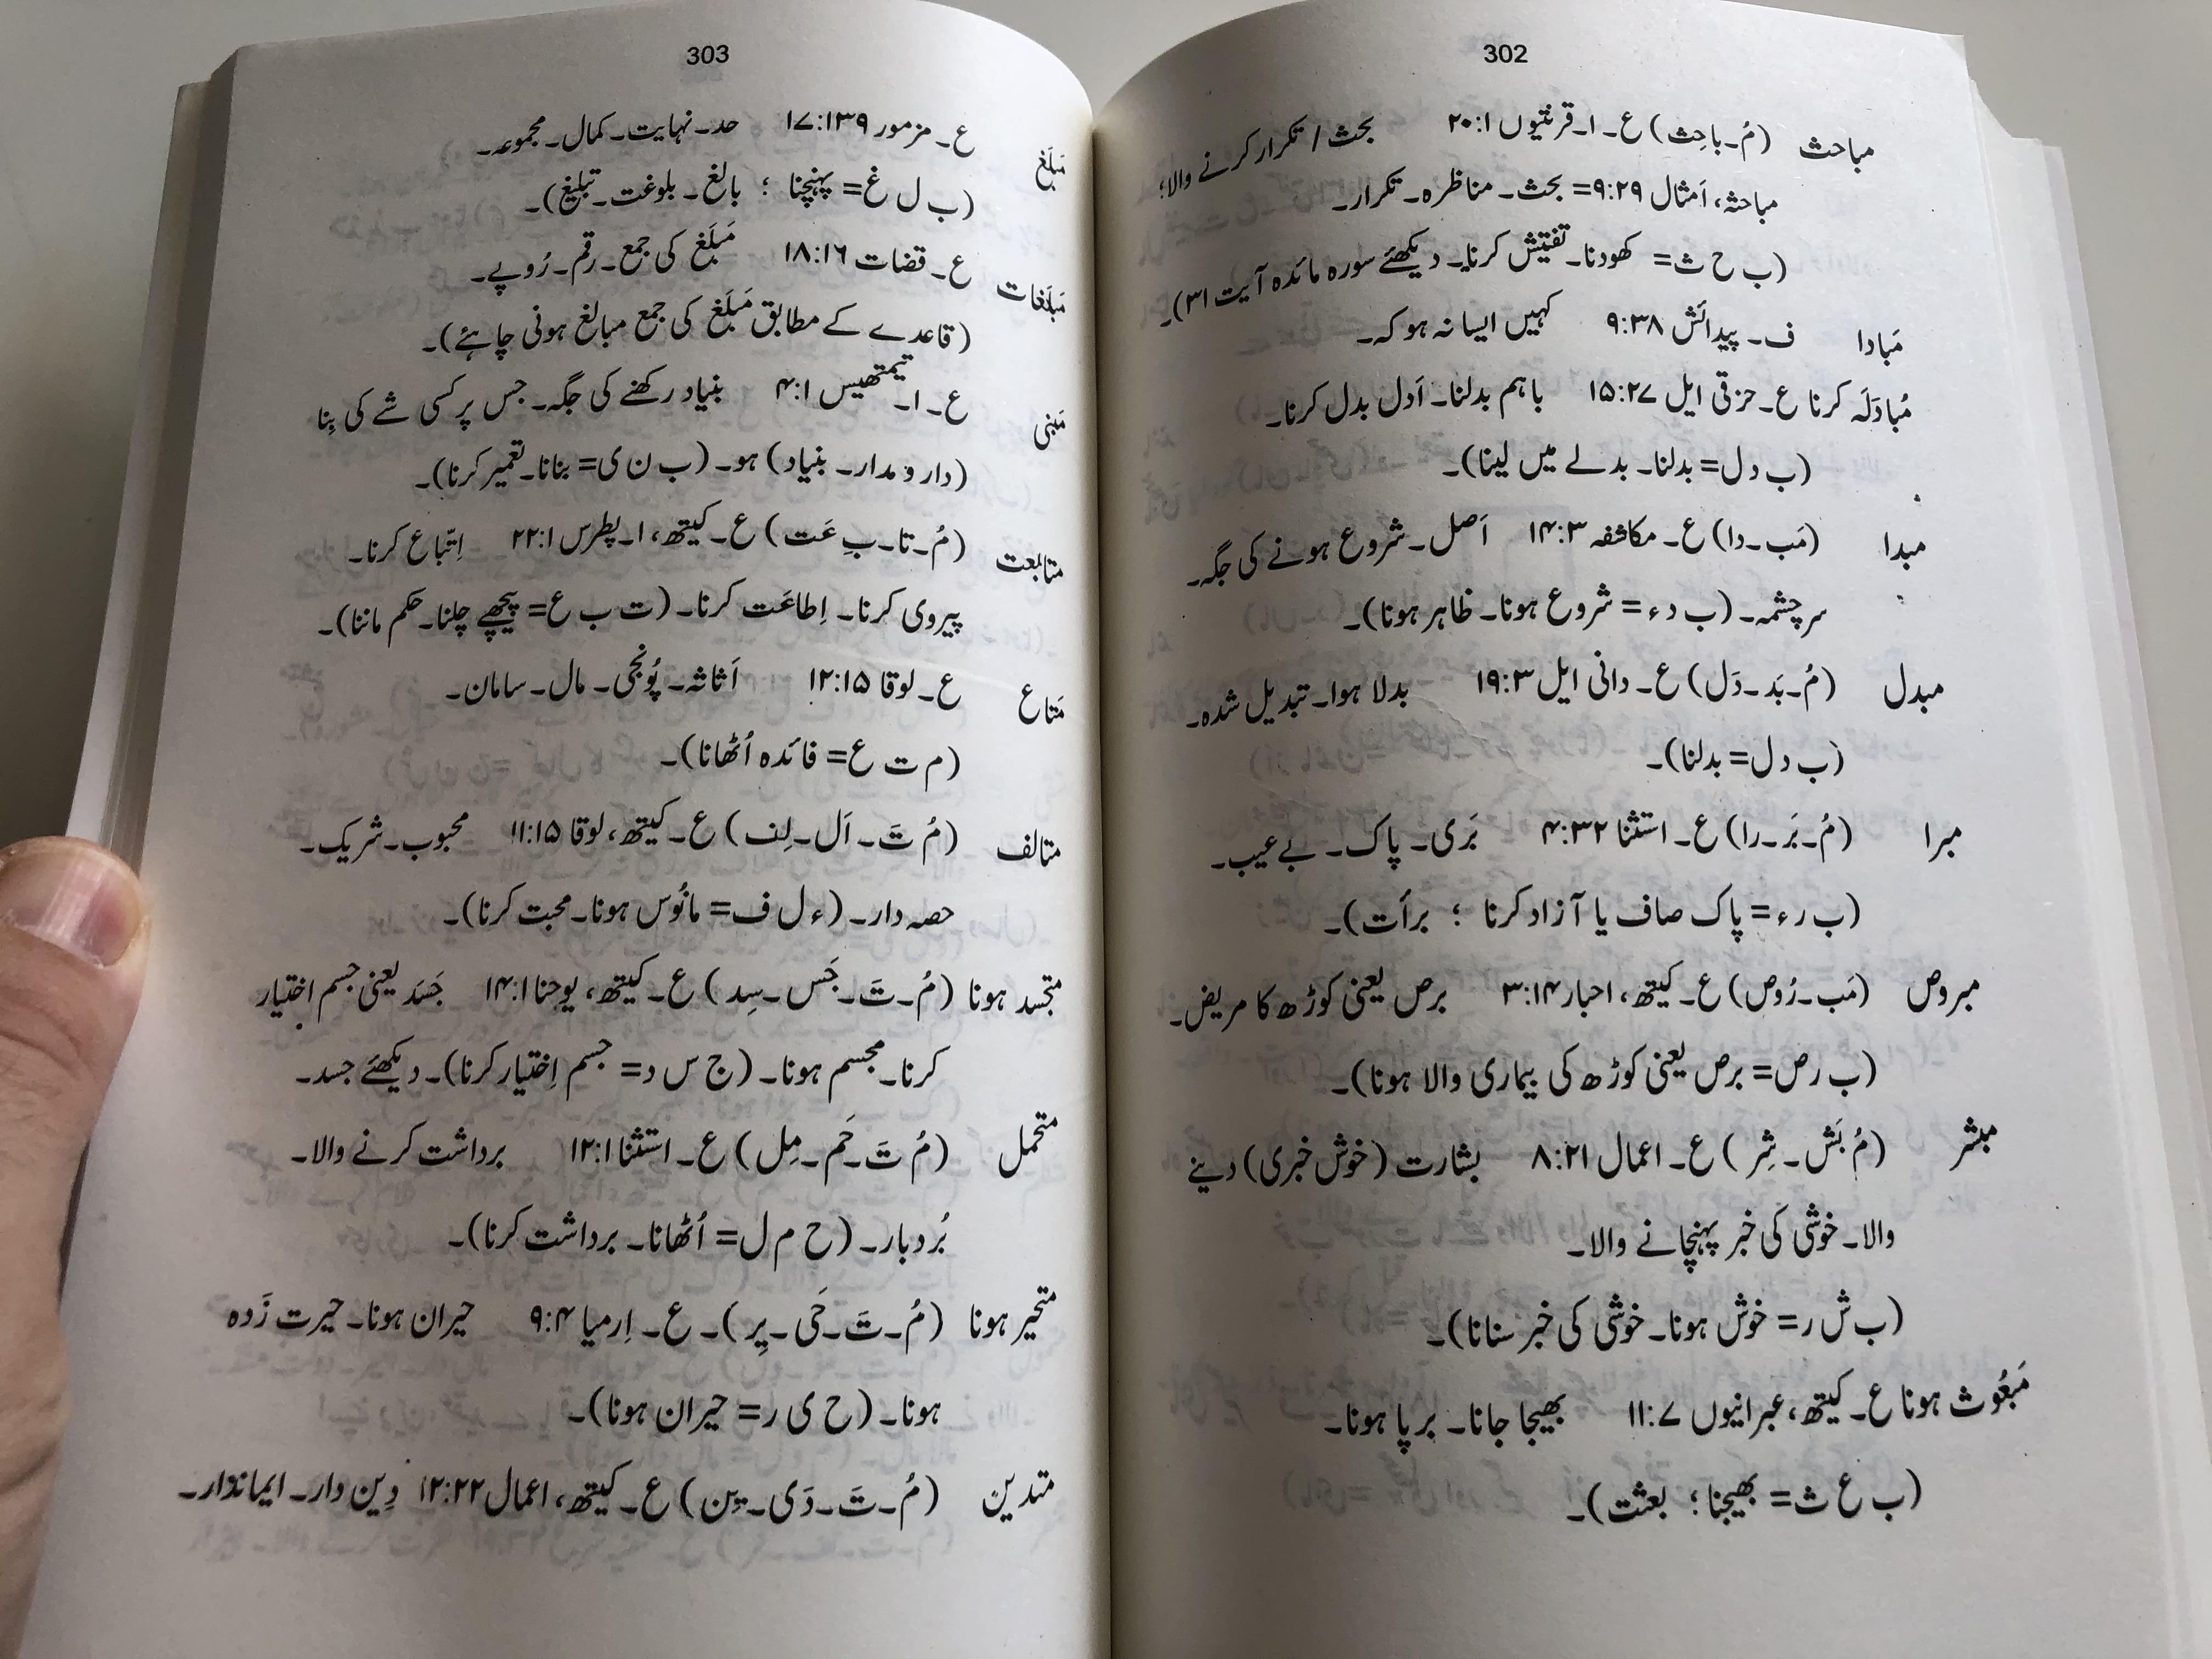 -dictionary-of-difficult-urdu-bible-words-by-younus-aamir-paperback-8-.jpg